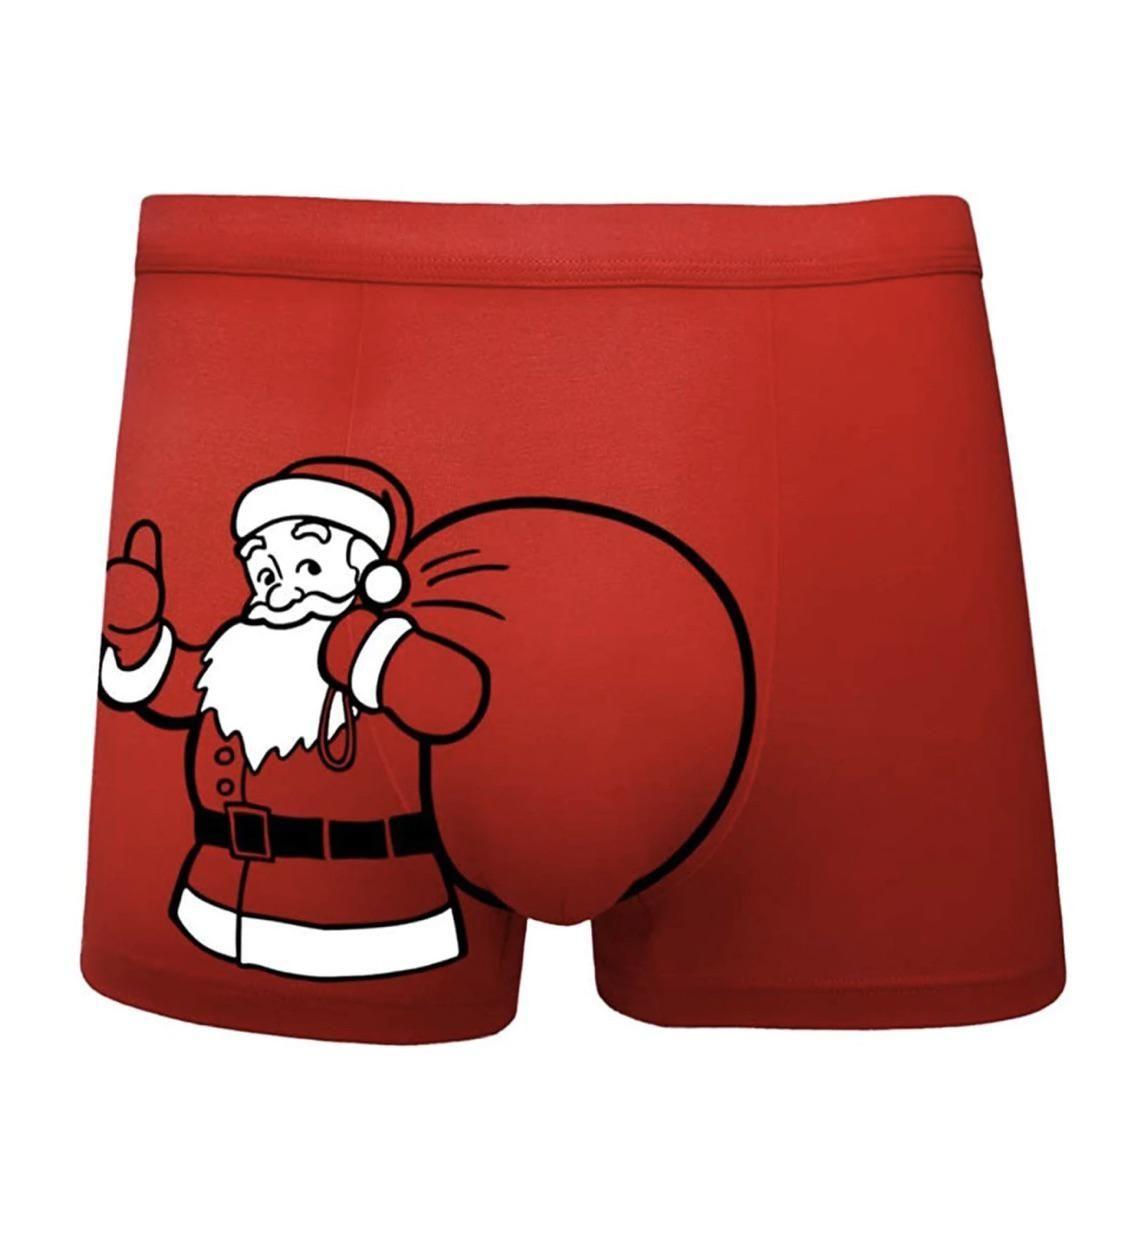 Santa's got a big package!